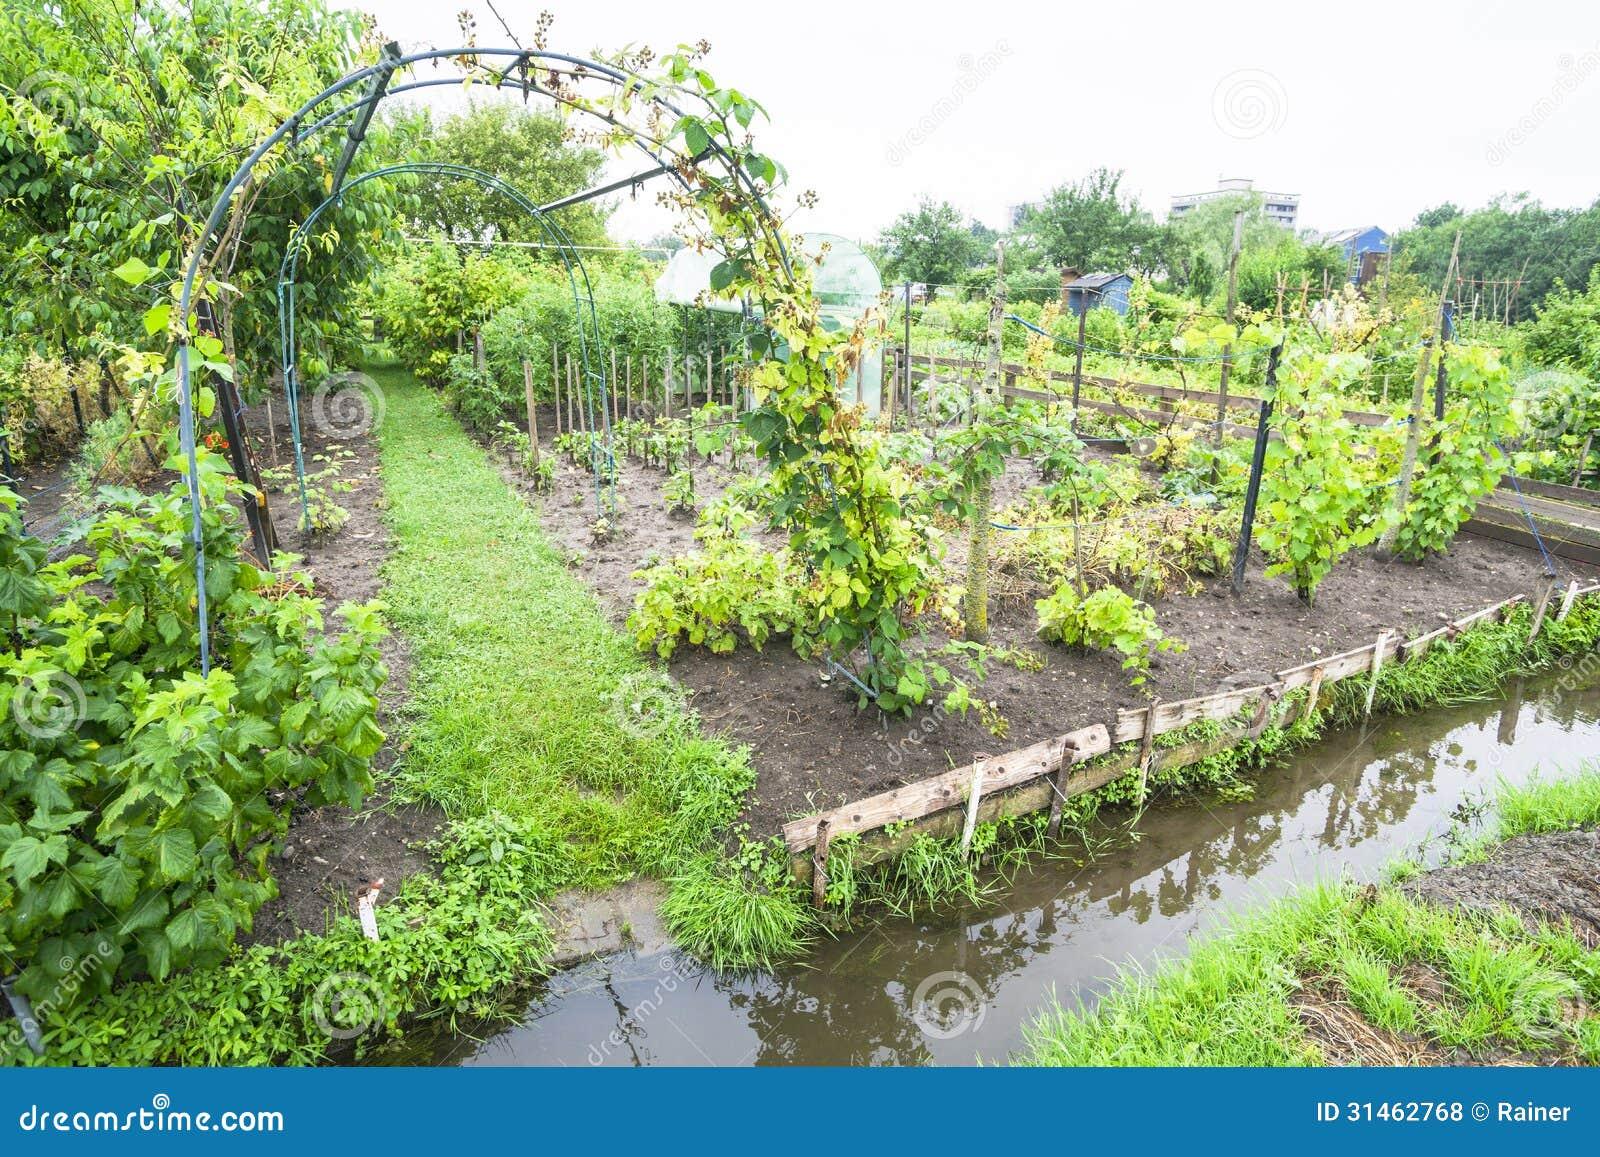 Garden Design Vegetable Patch : Free vegetable garden photos design patch good ideas